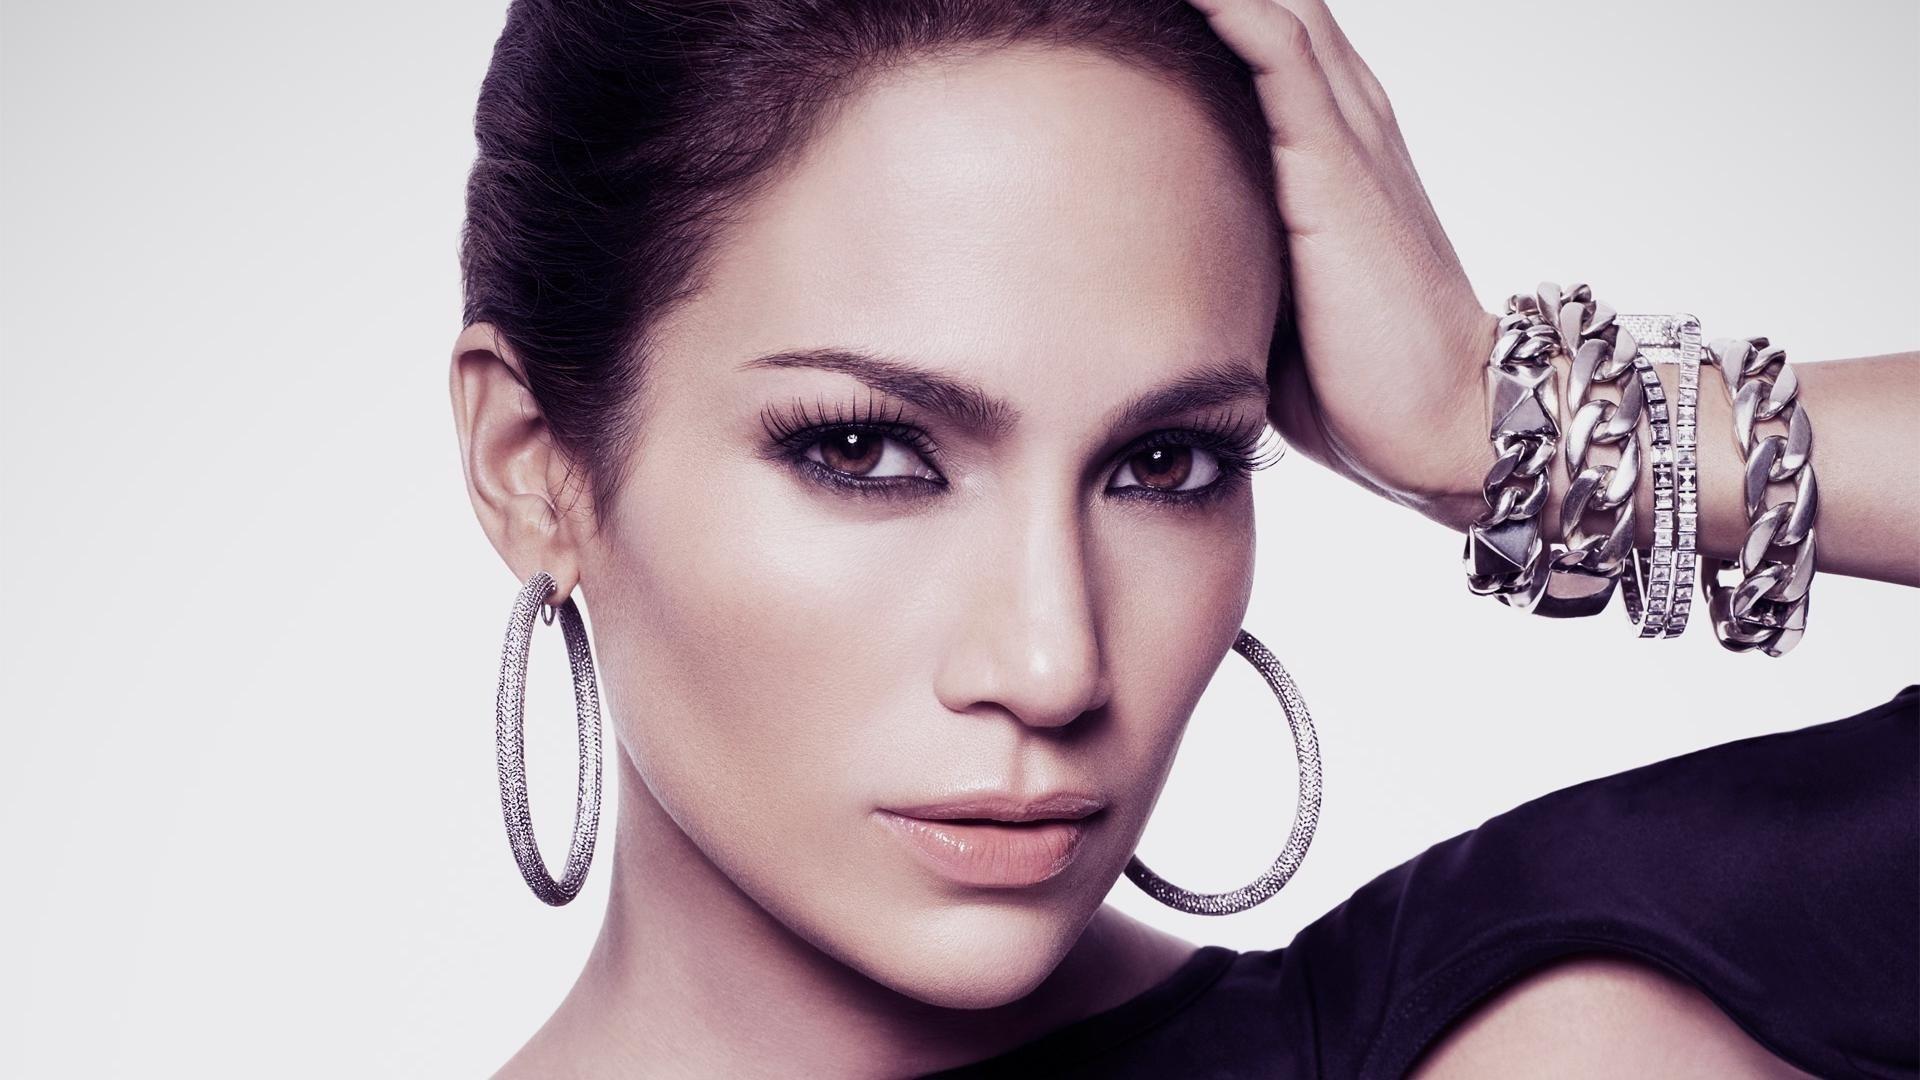 Jennifer Lopez Full HD Wallpaper And Background Image